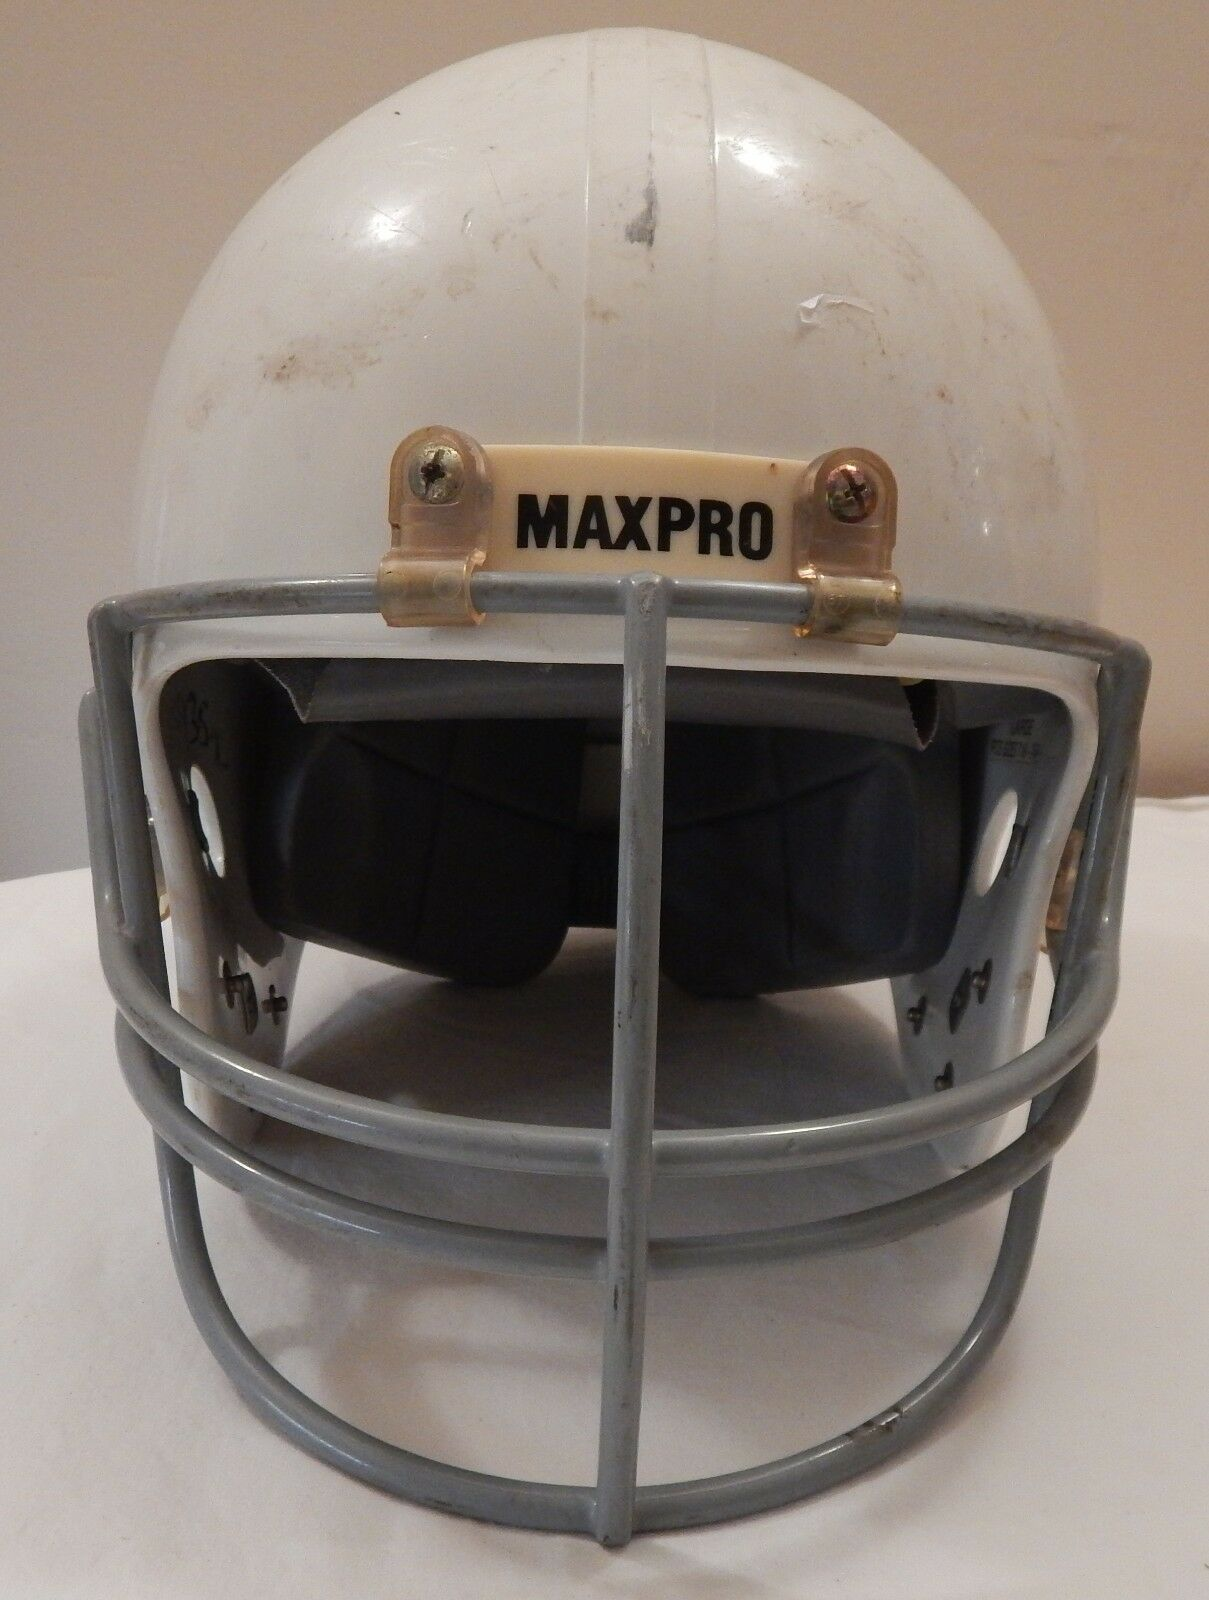 Vintage MAXPRO ALL AMERICAN Football Helmet Model 2001 WHITE SZ ADULT L USA MADE